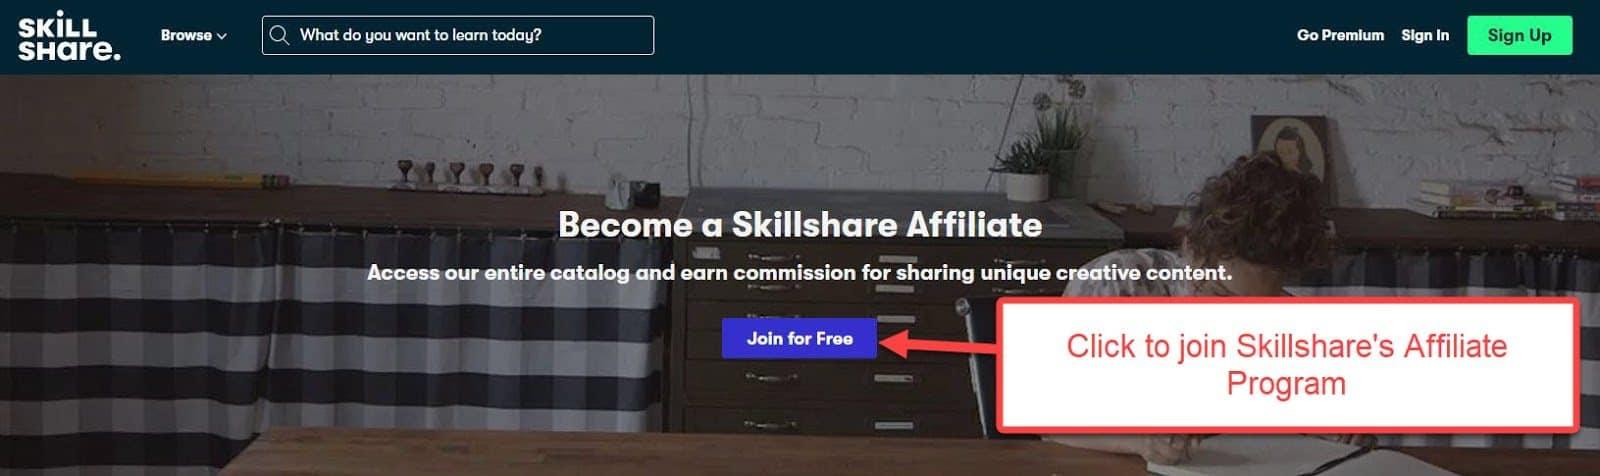 Skillshare affiliate